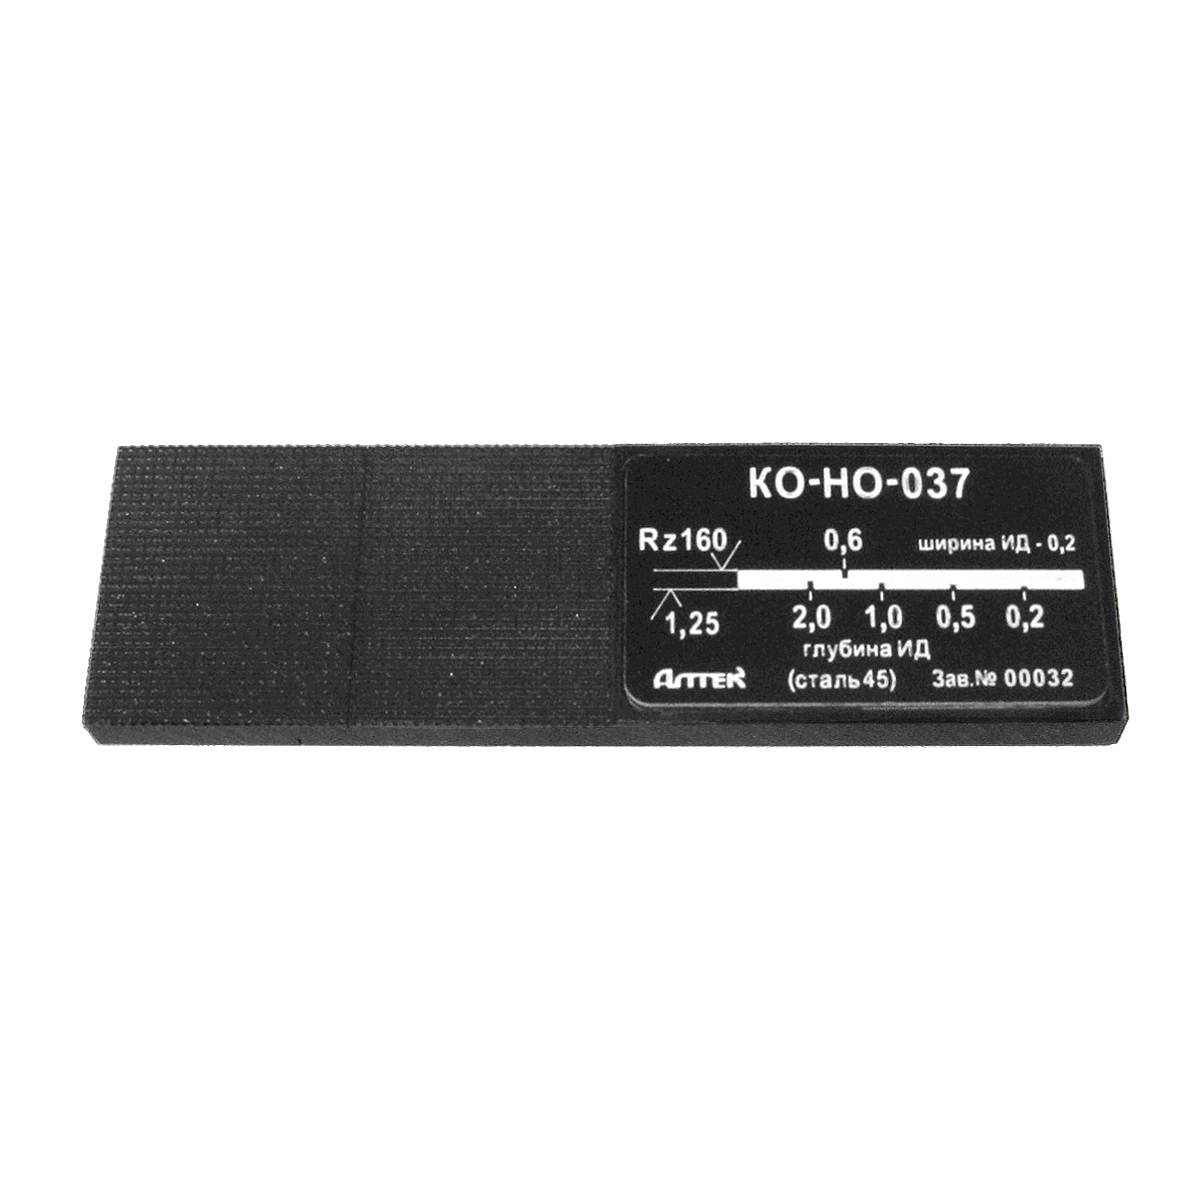 KO HO 0371